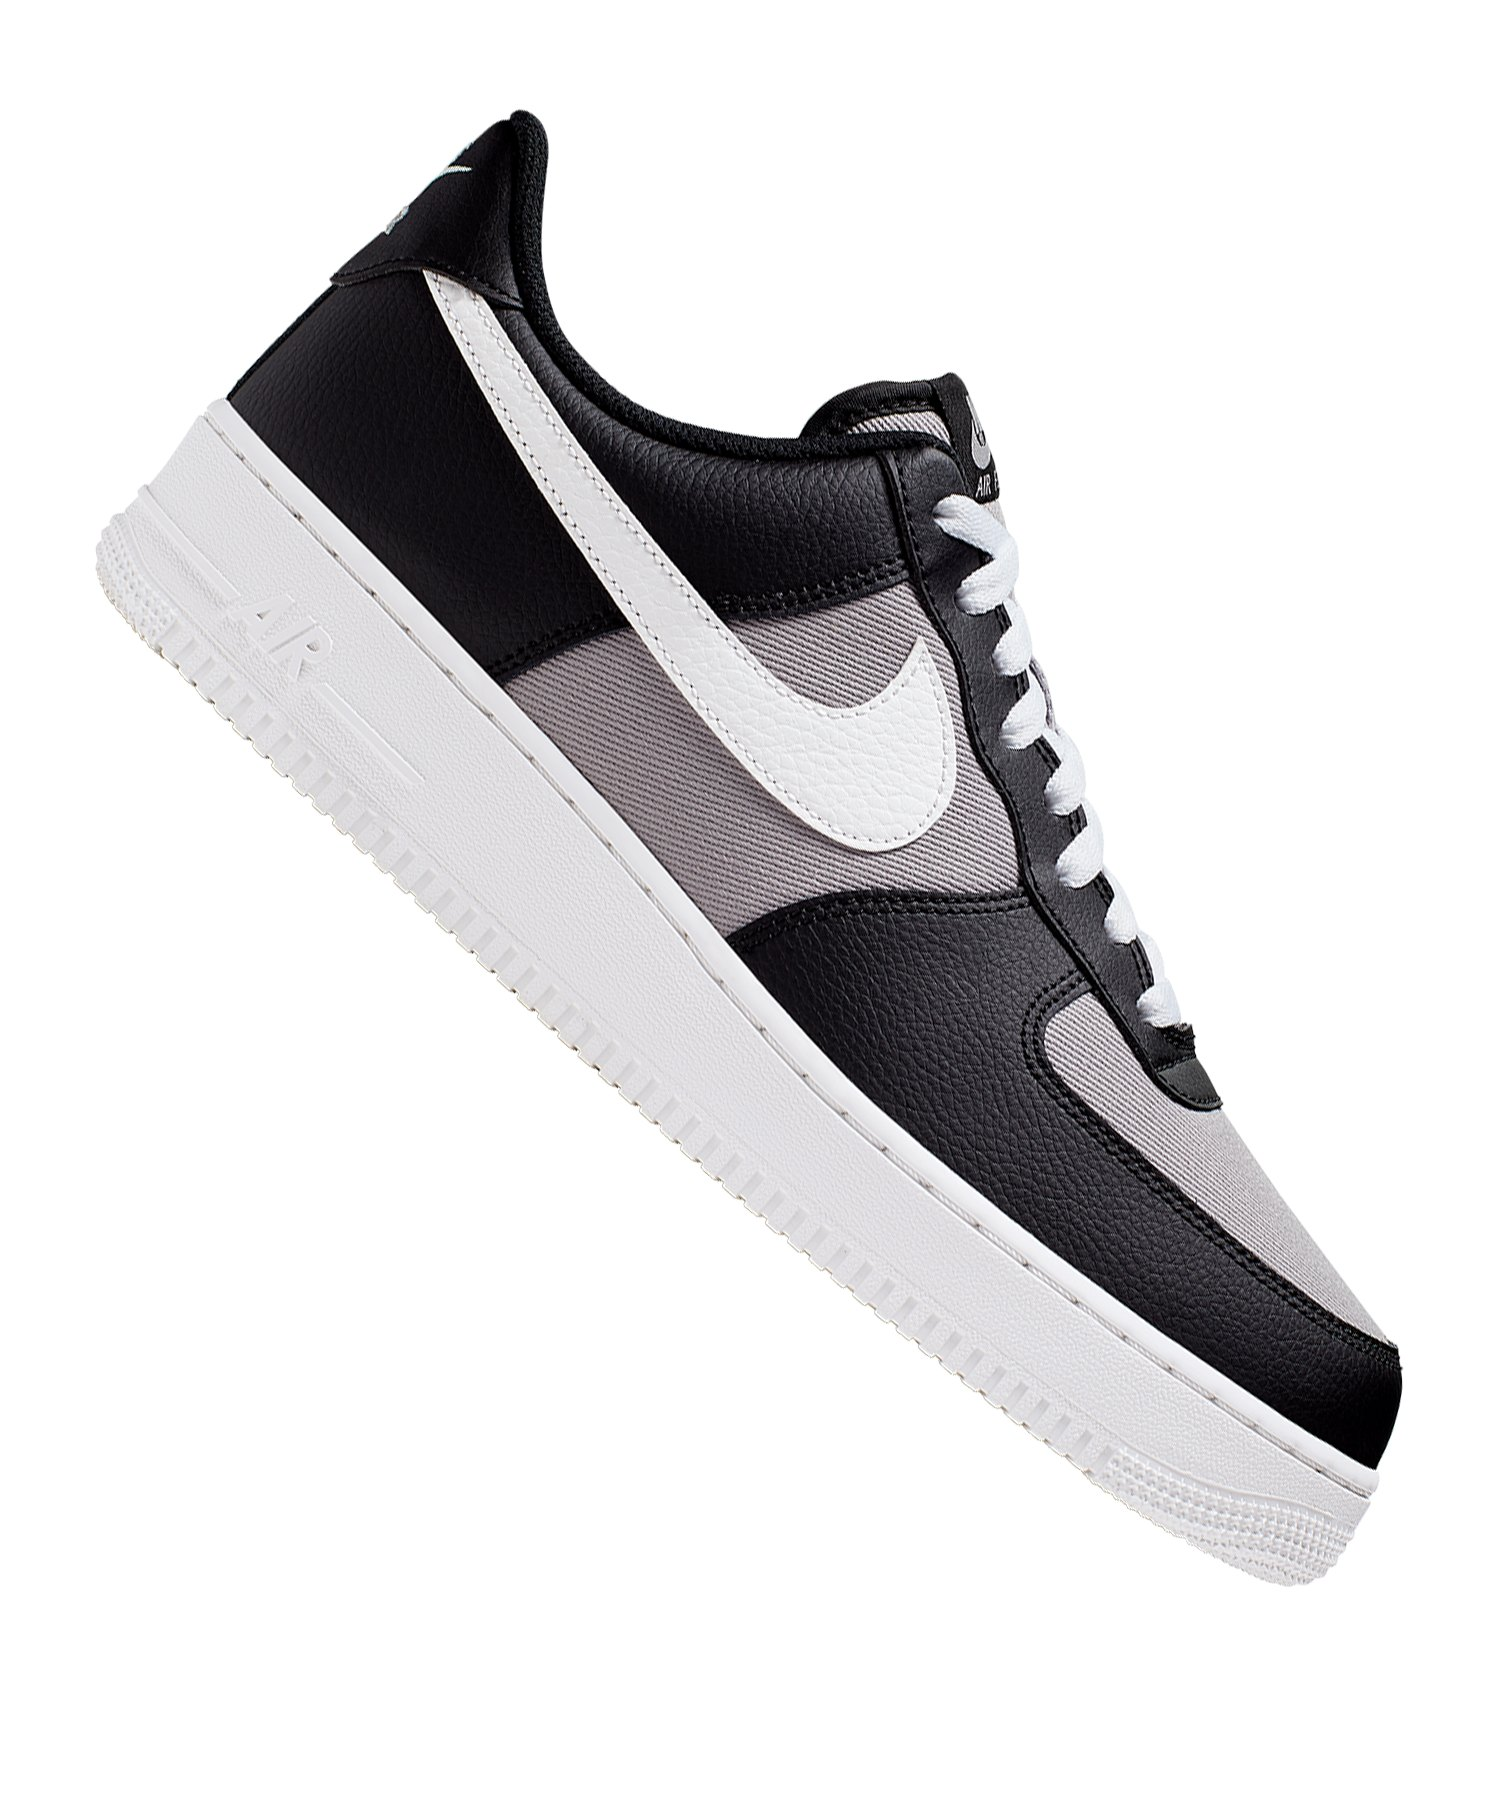 Nike Air Force 1 07 1 Sneaker Schwarz F001 - schwarz